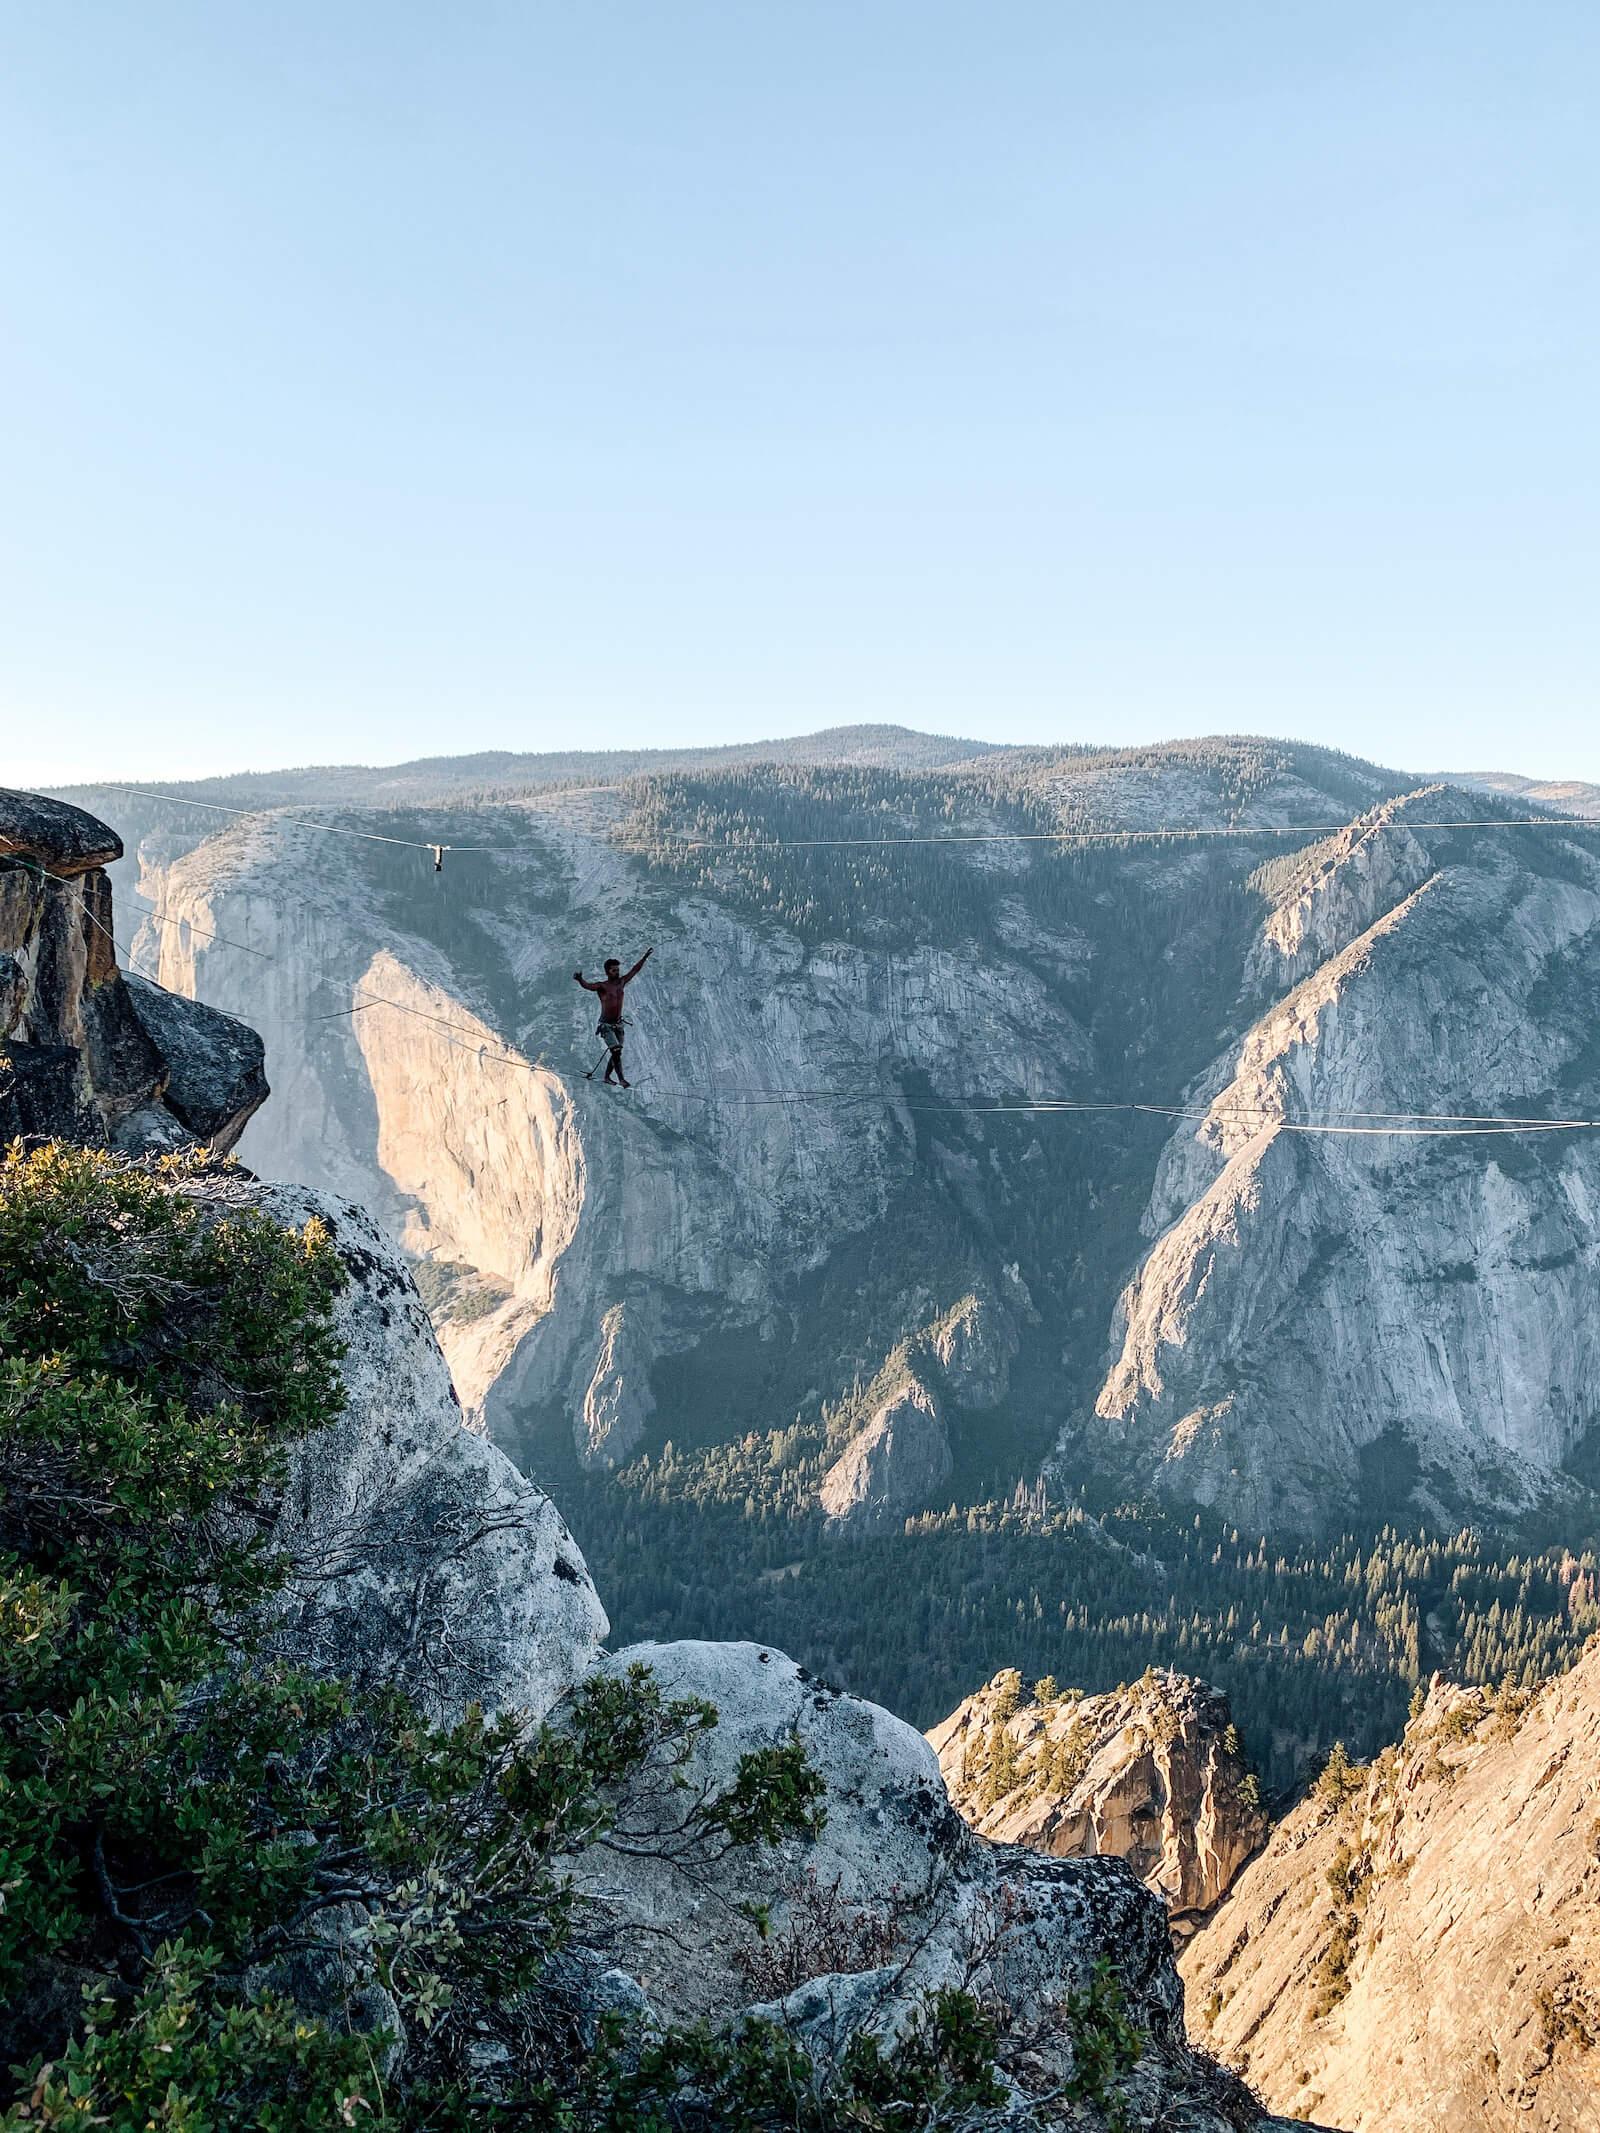 Yosemite National Park - Taft Point